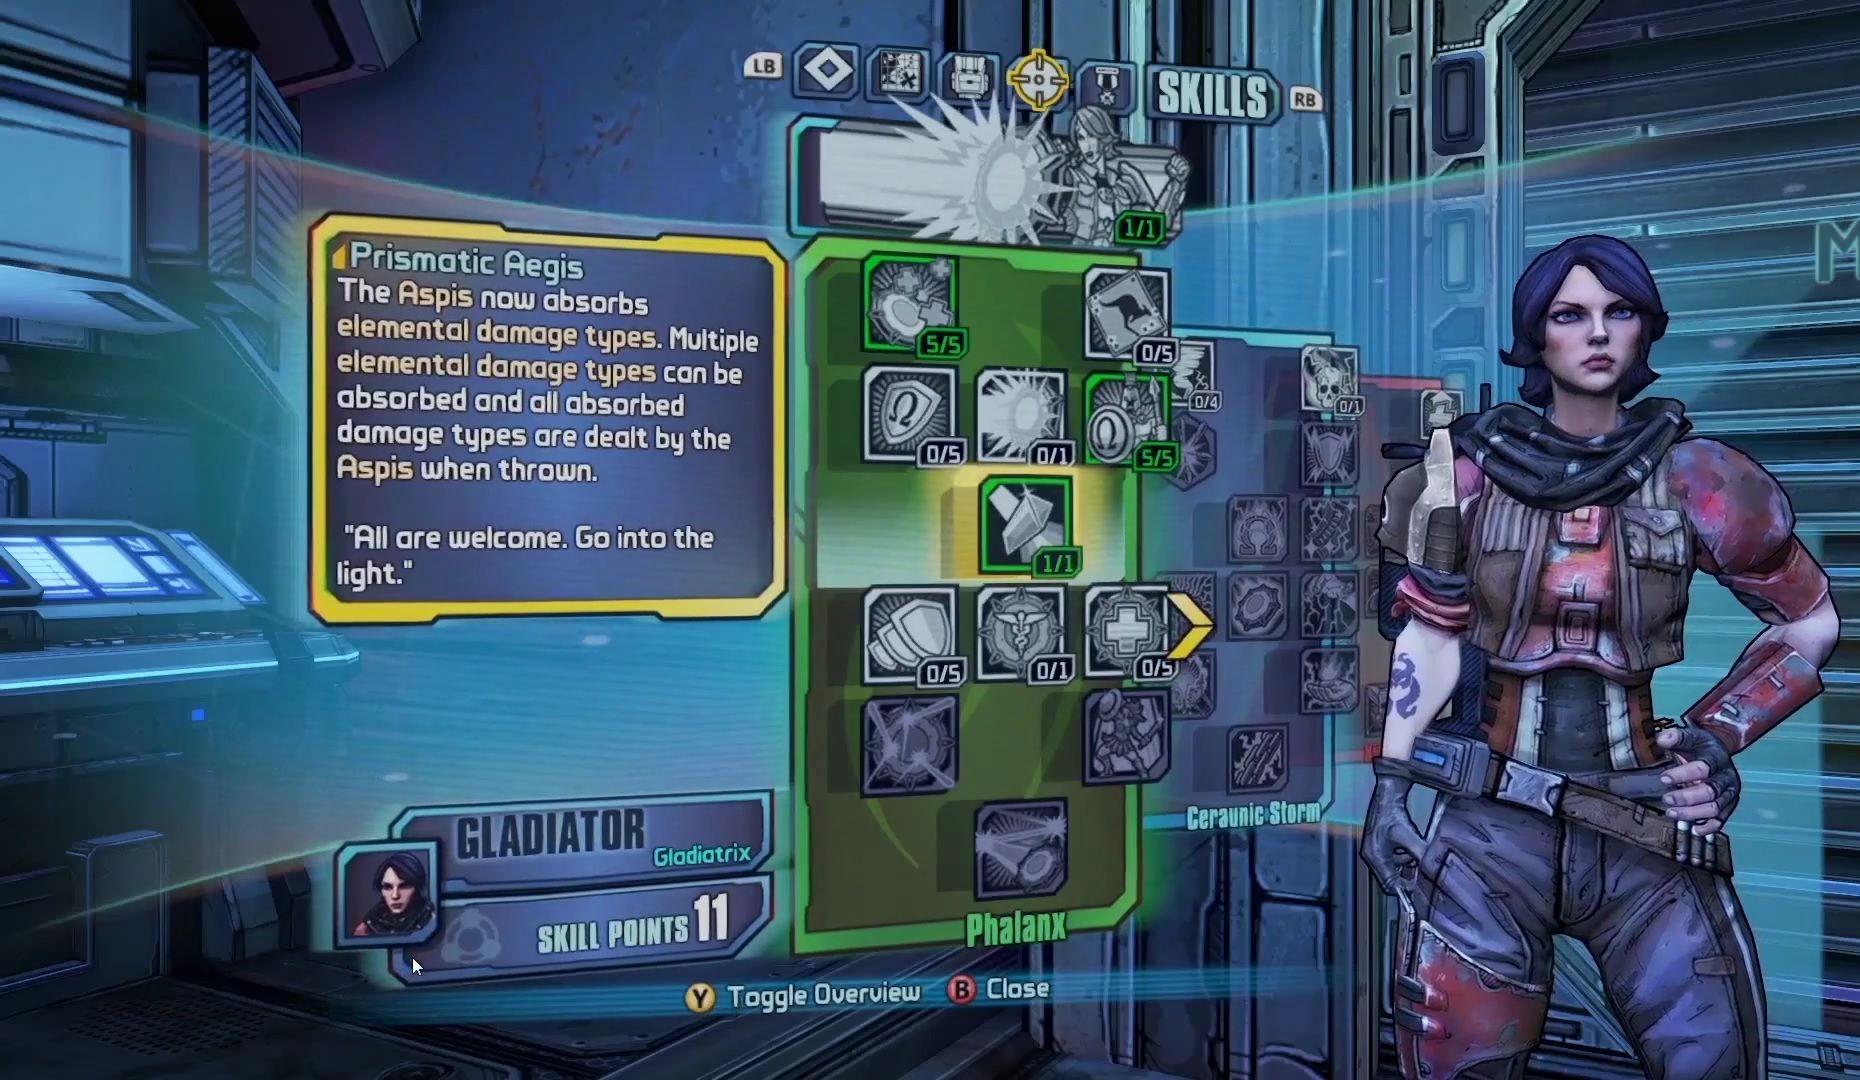 Borderlands The Pre Sequel Gets 15 Minute Gameplay Walkthrough Lightning Gaming News Borderlands Pax East Gameplay